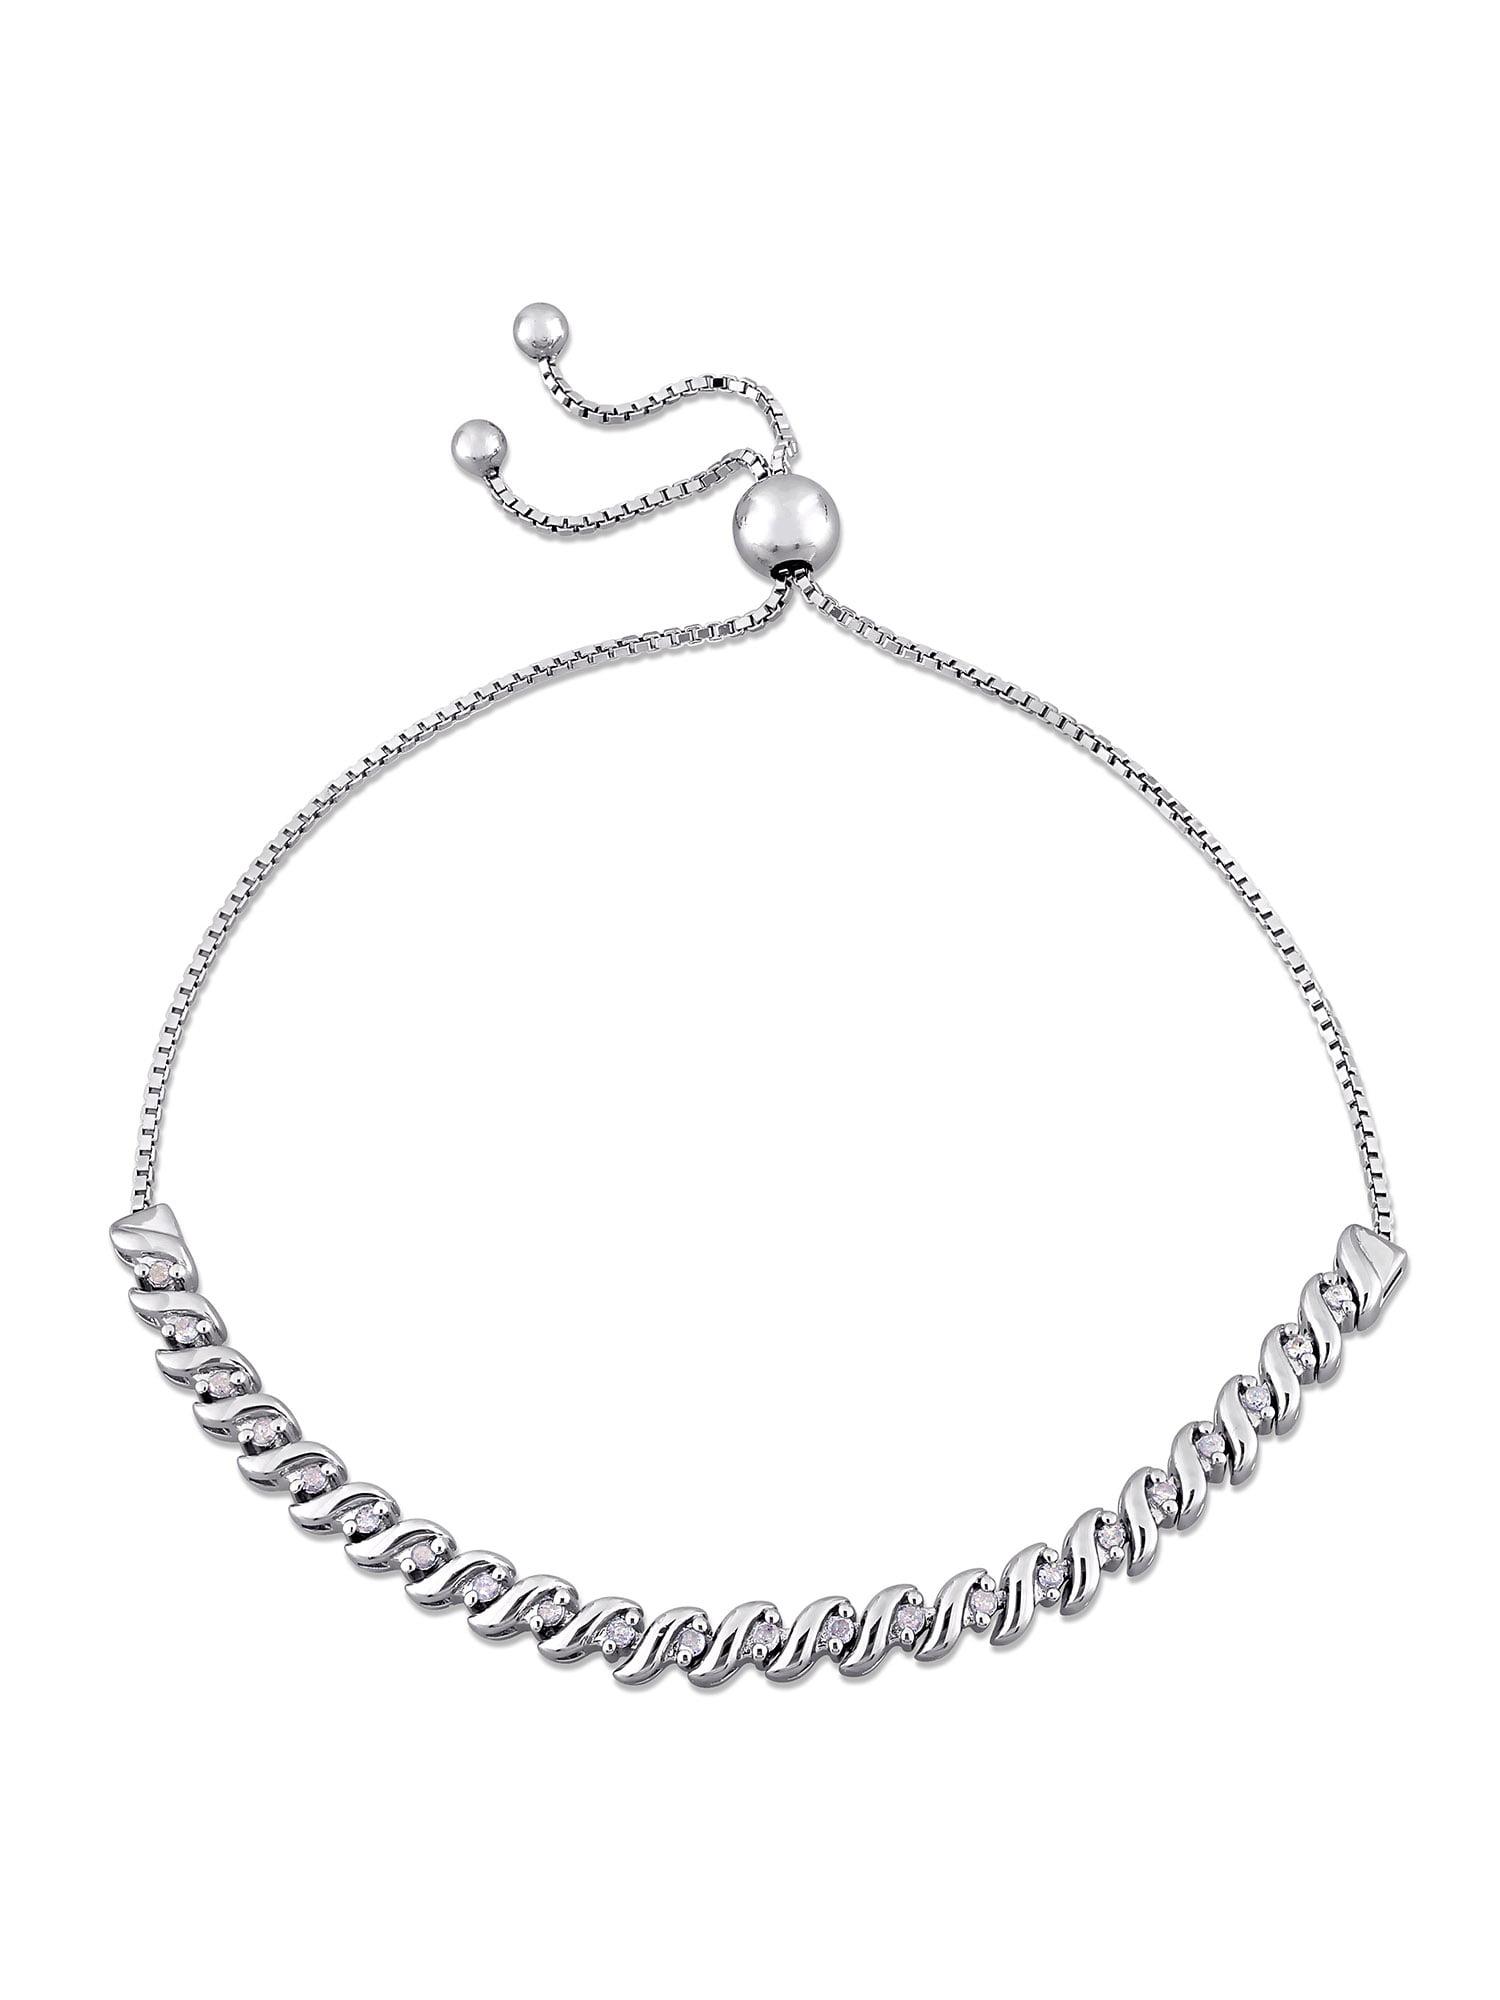 "Miabella 1 4 Carat T.W. Diamond Sterling Silver Bolo Bracelet, 9"" by Miabella"